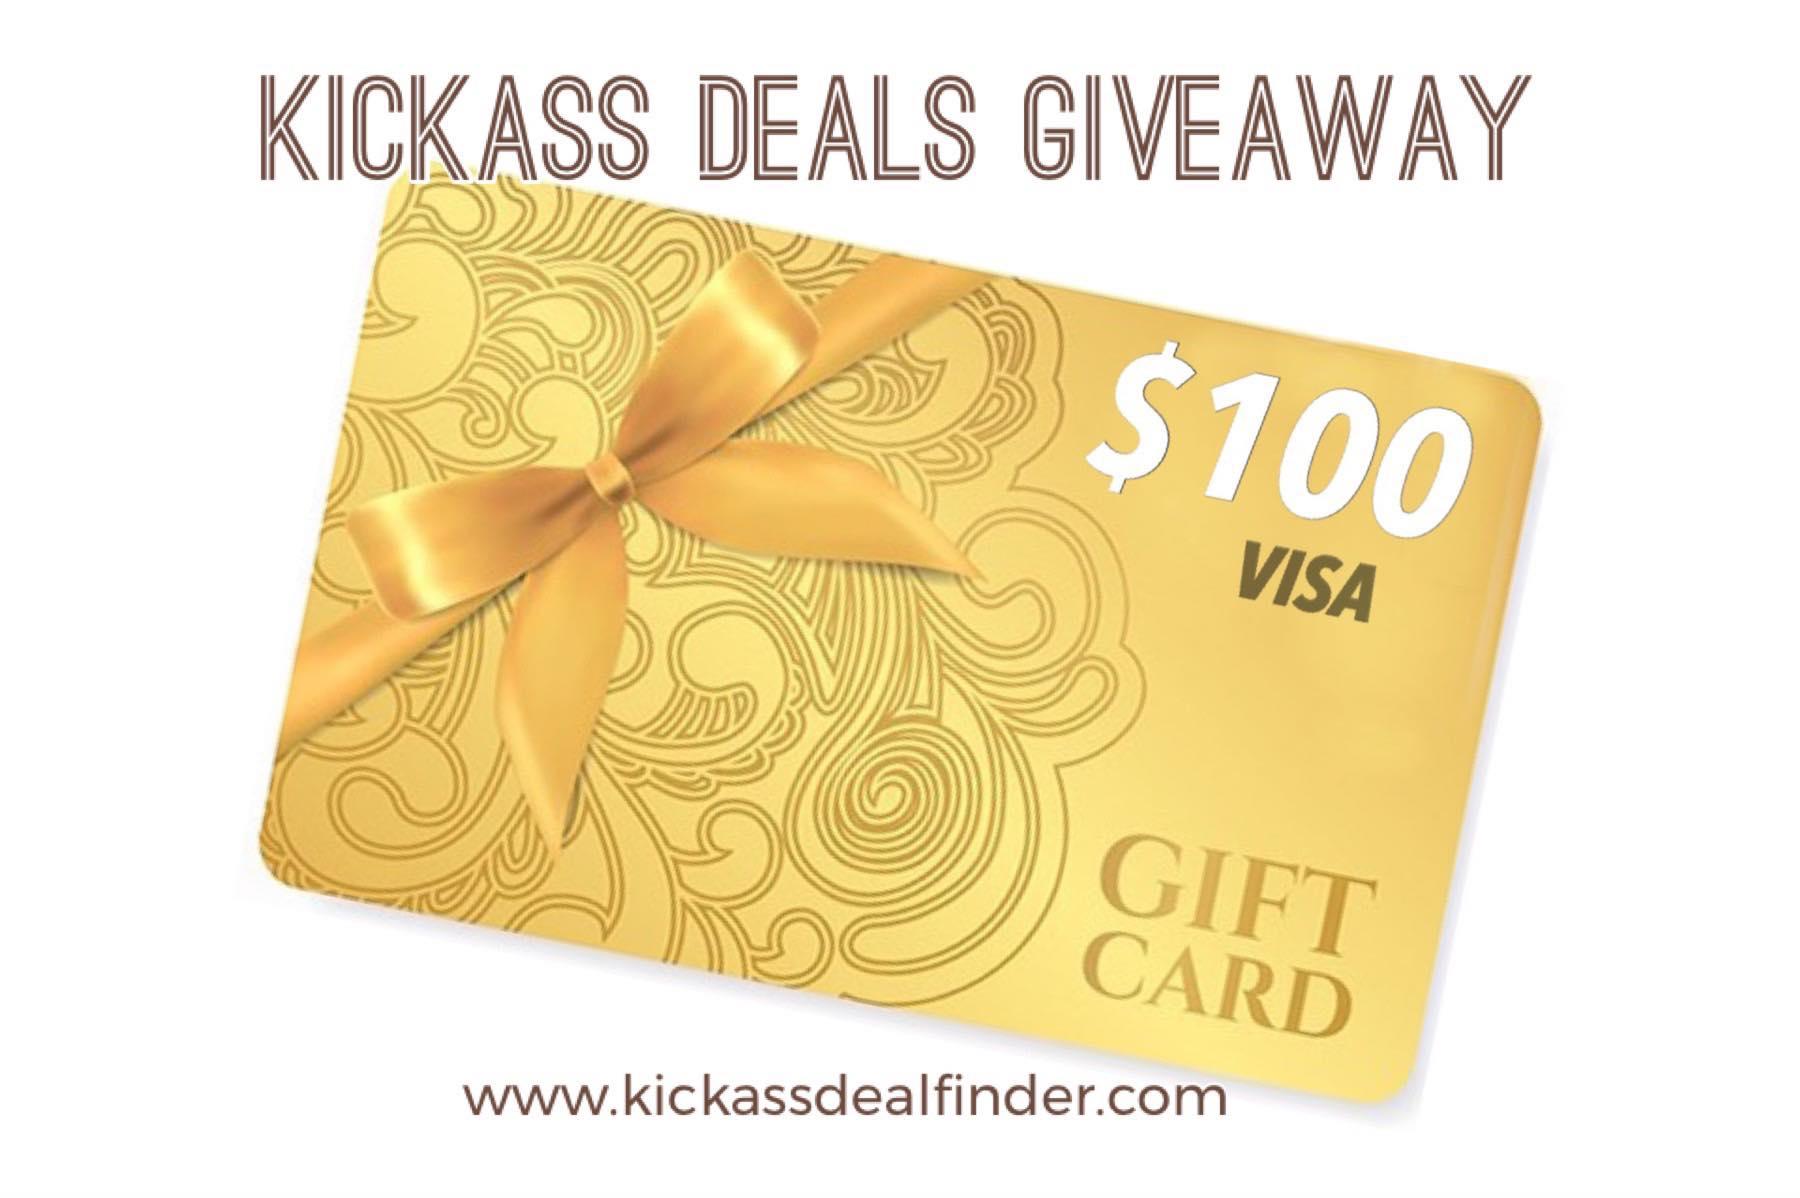 Win a $100 VISA Giftcard Giveaway Image